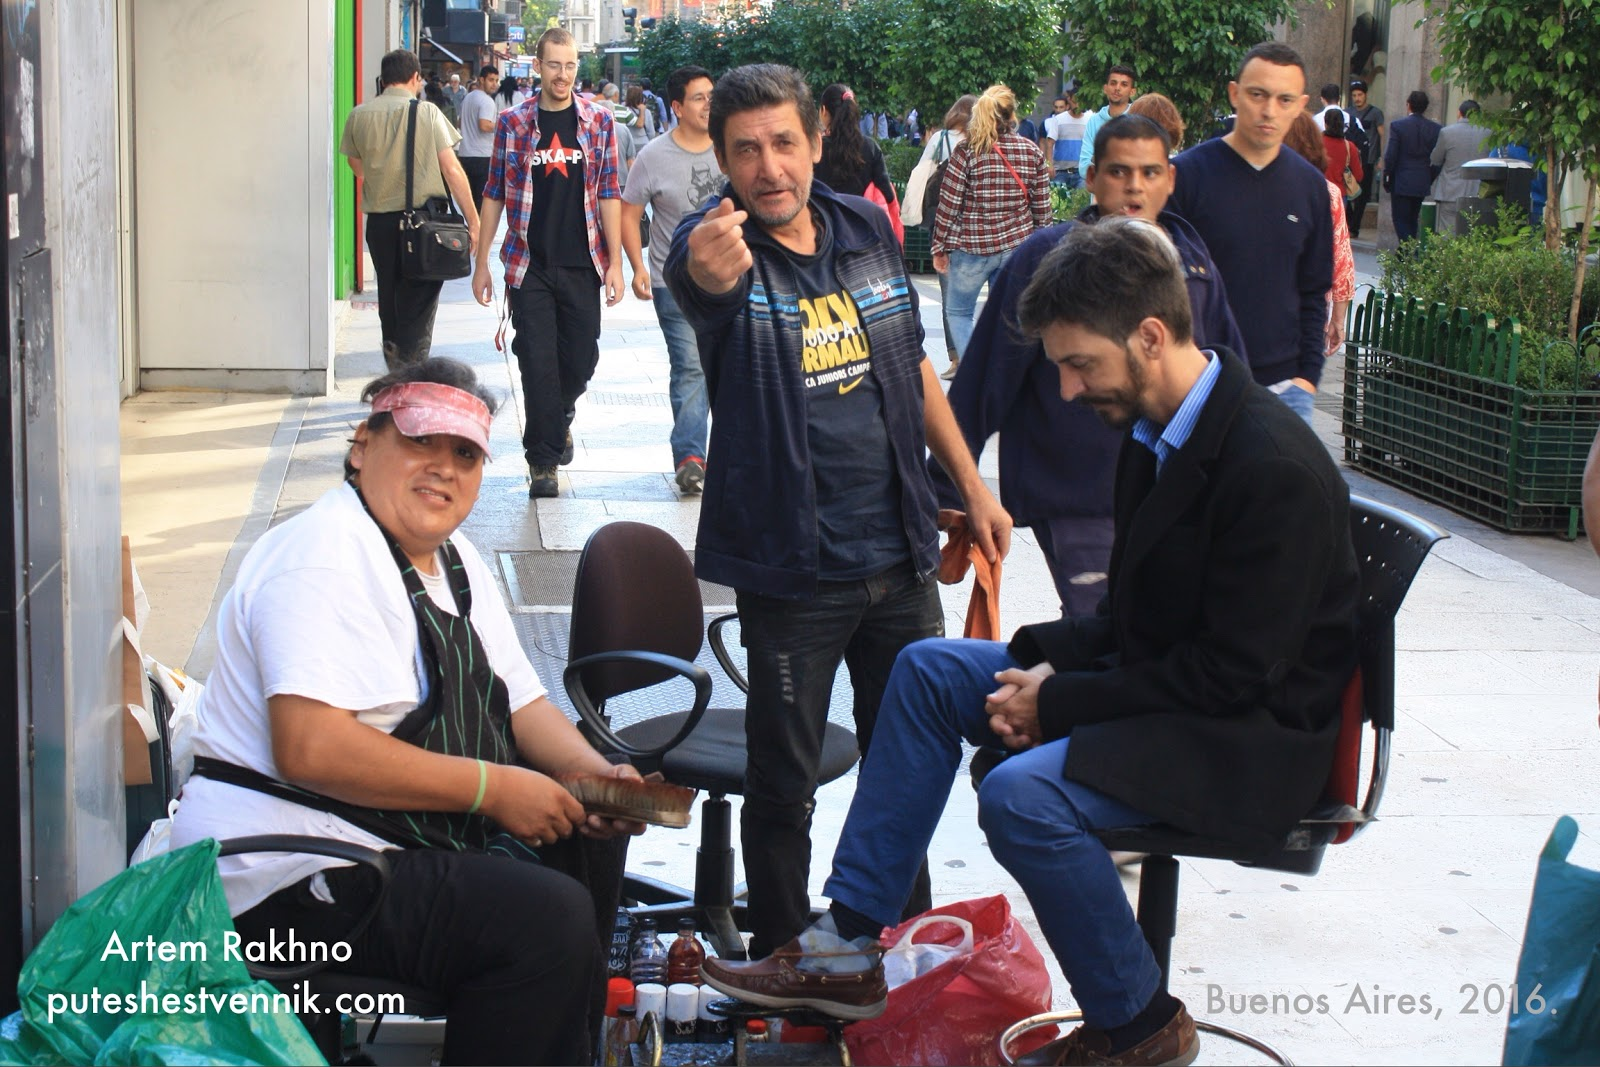 Чистильщик обуви в Буэнос-Айресе